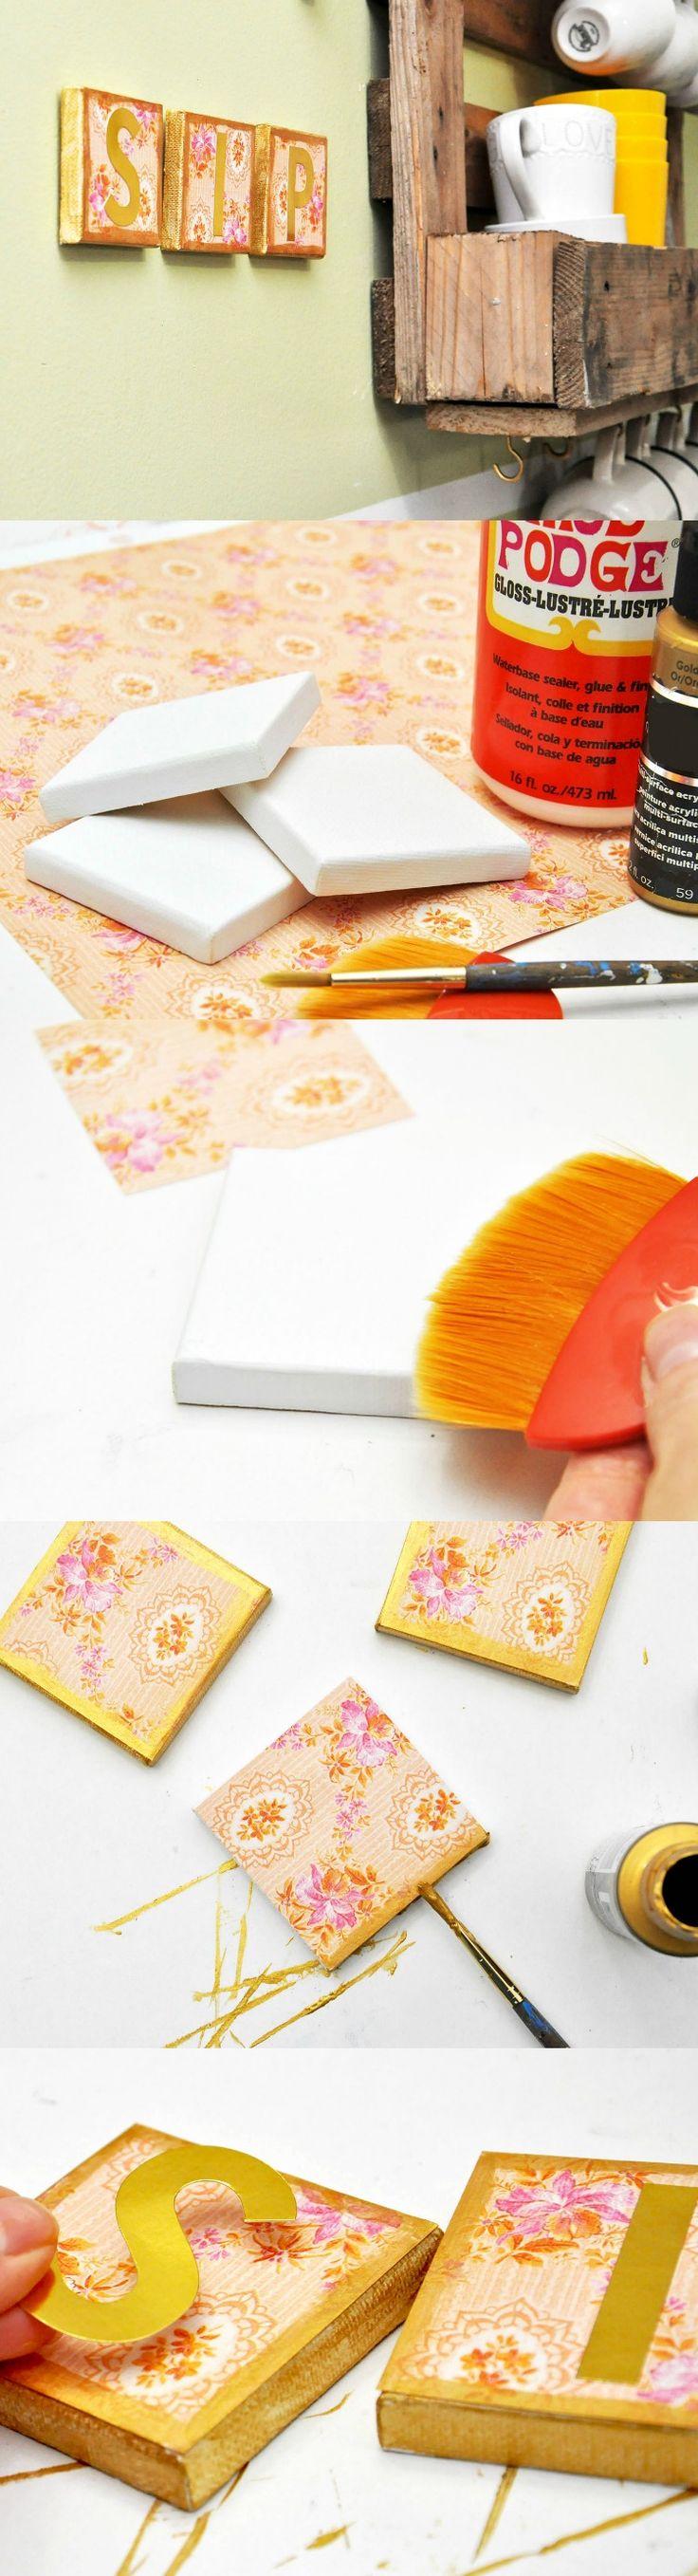 How to scrapbook canvas - Decoupage Sip Diy Canvas Art